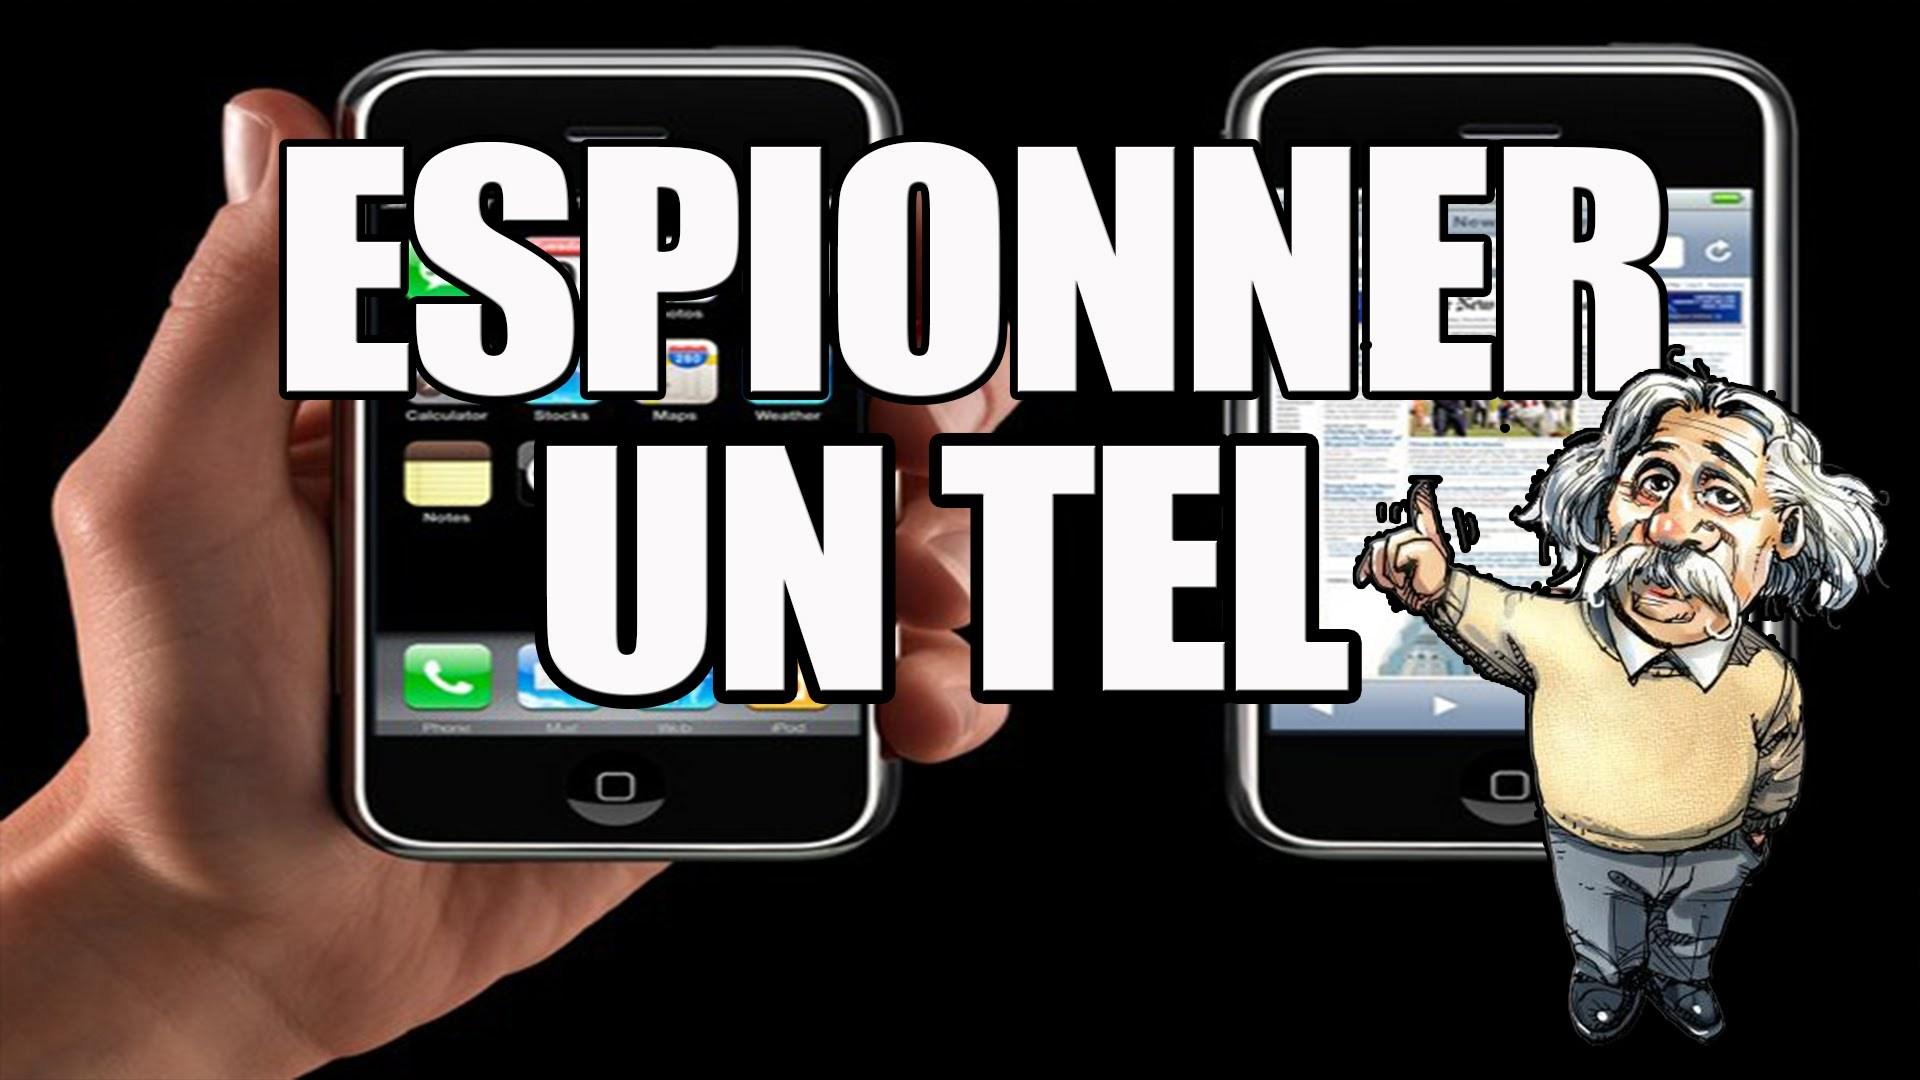 Comment Pirater Un Iphone C